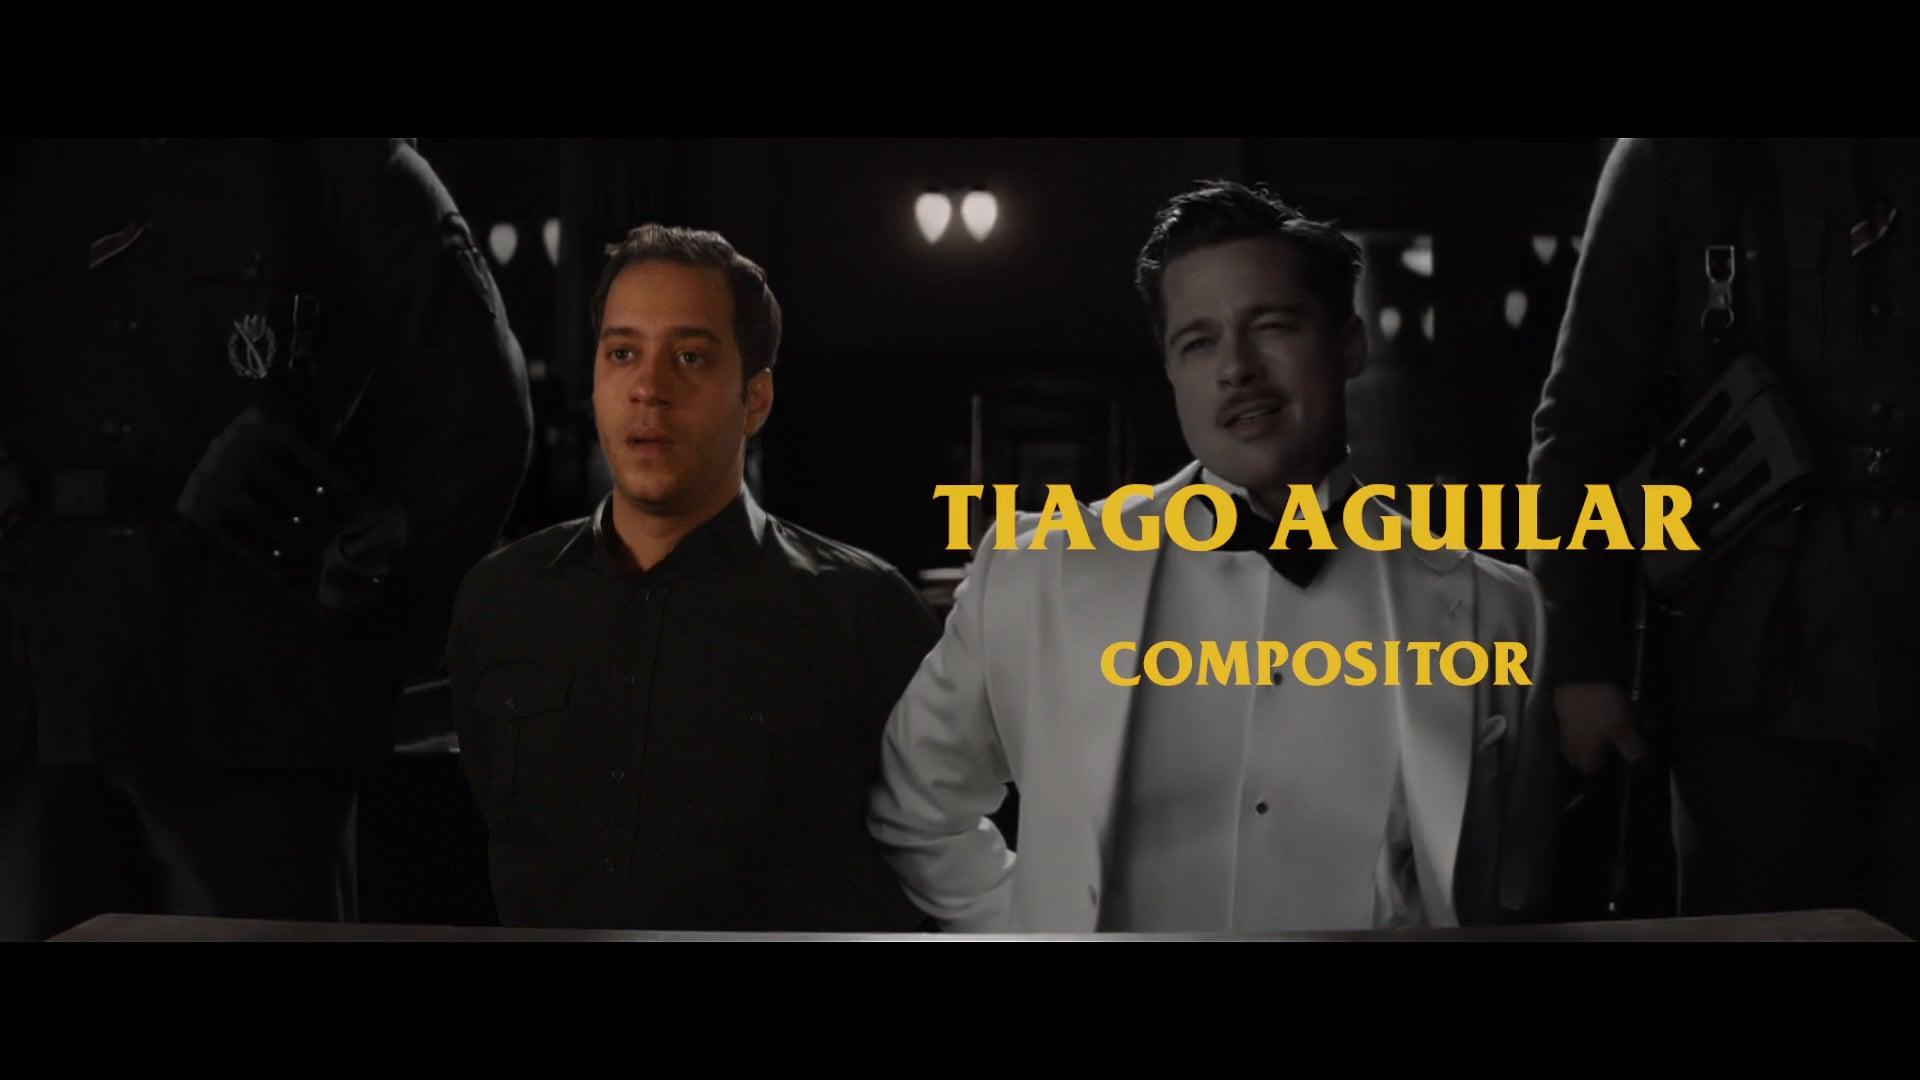 DEMO REEL - LBS 027 - TIAGO AGUILAR